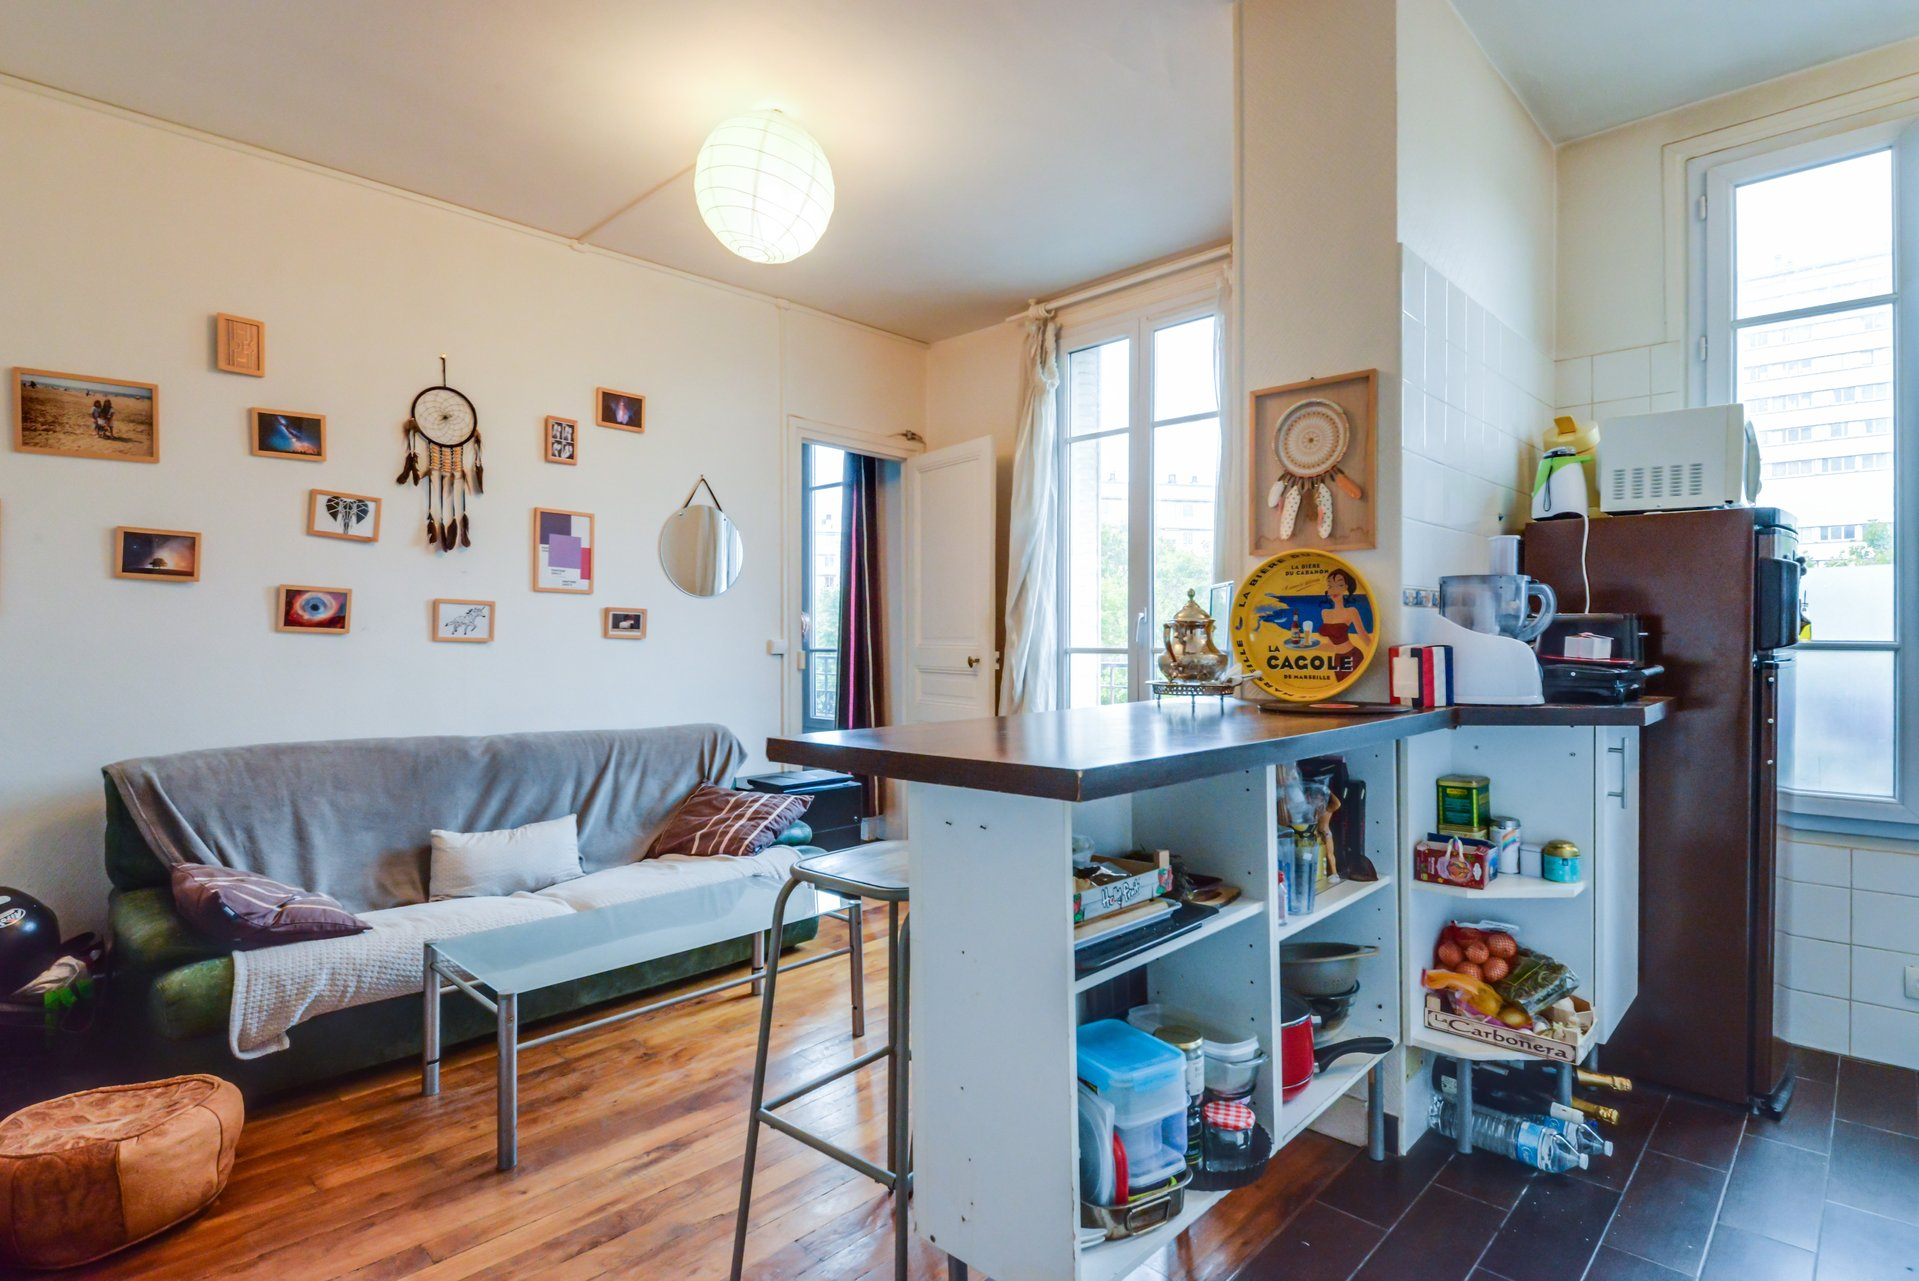 92110 - Clichy - Rue Léon Blum